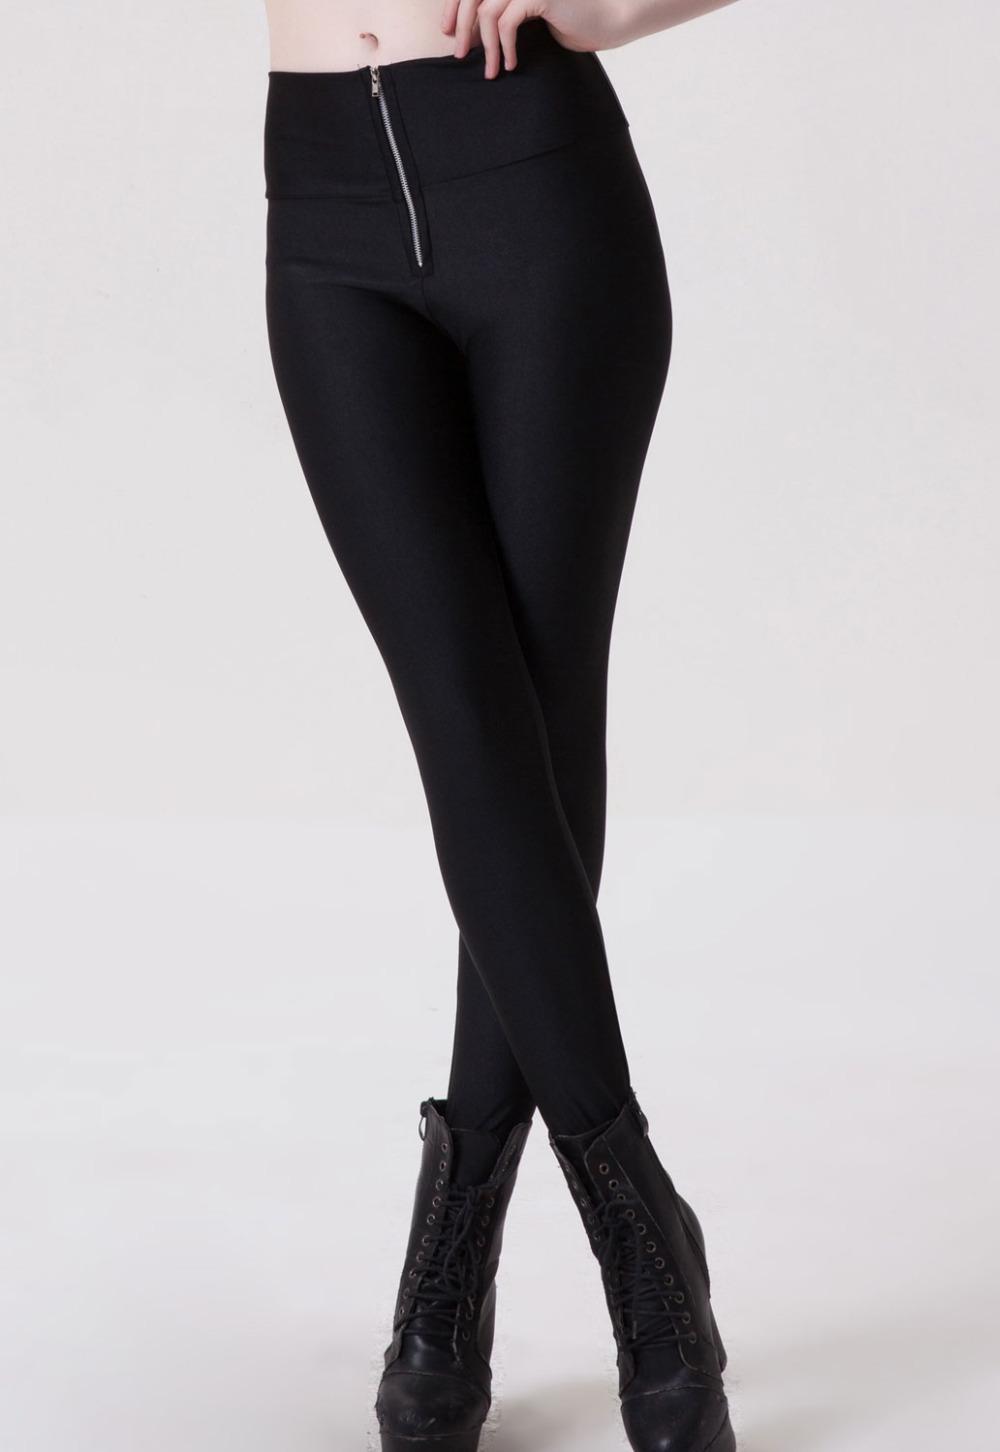 Original Home  Seductive Skinny Side Pocket Zipper Leather Pant For Women